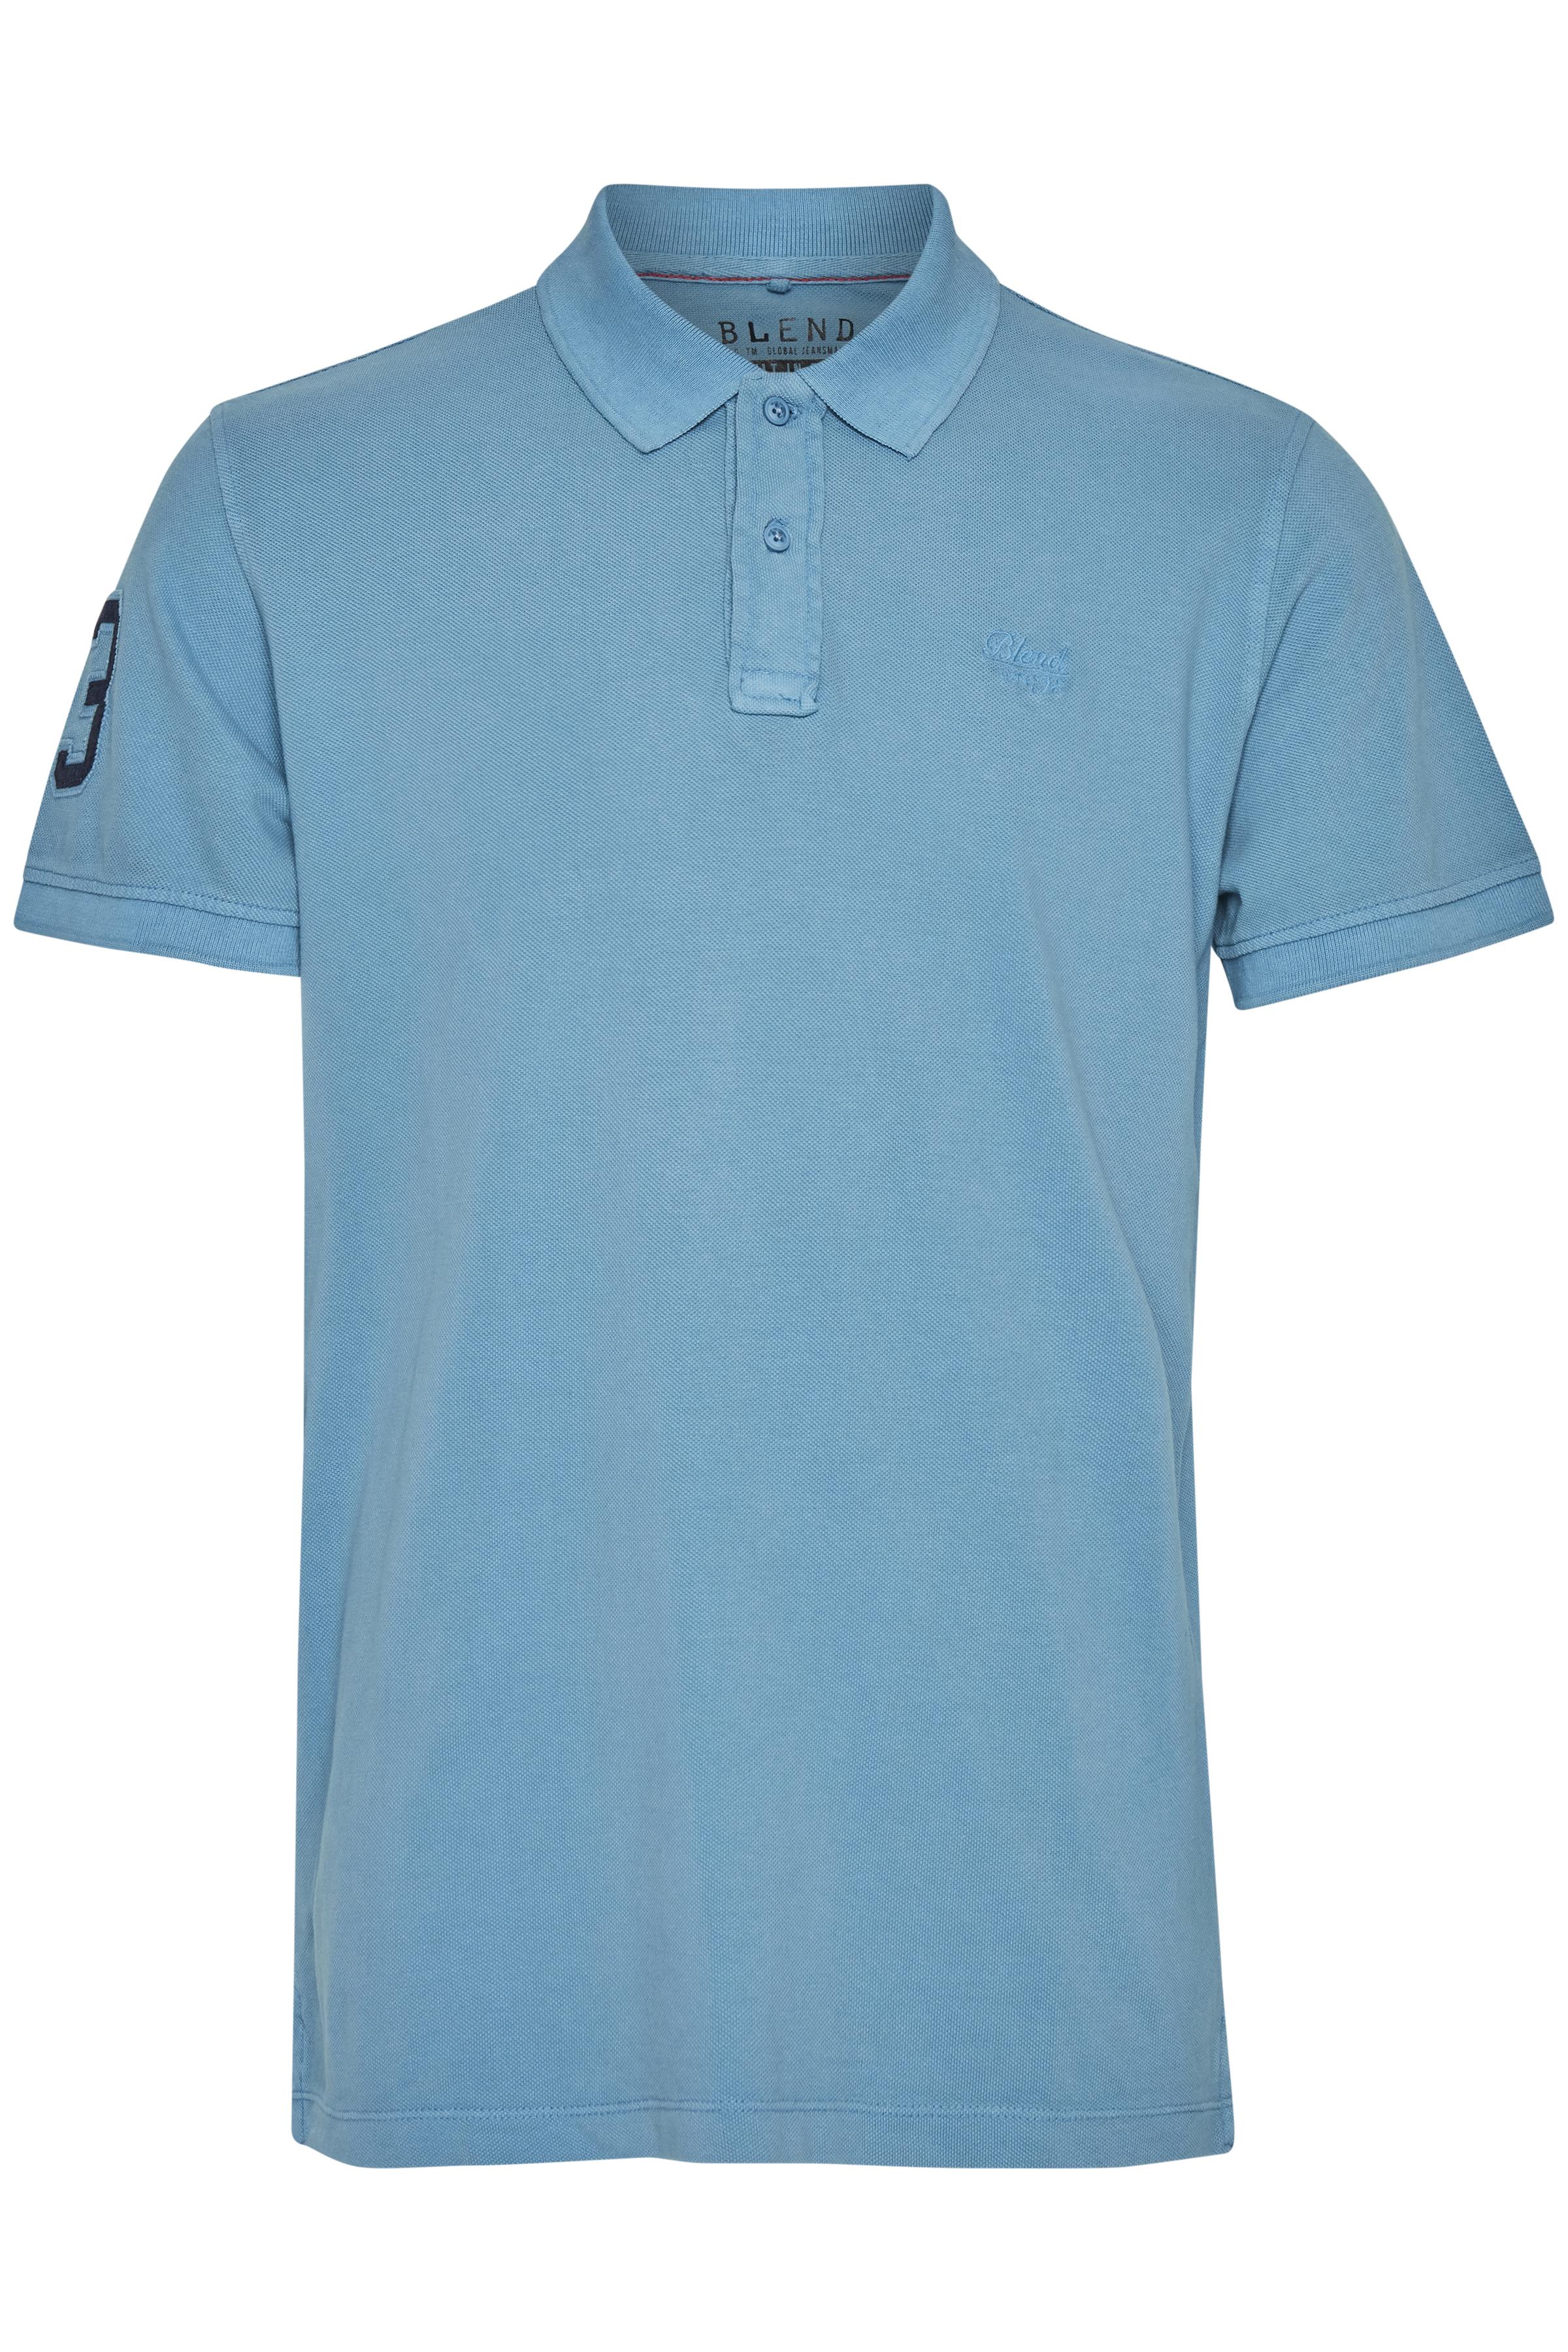 Image of   Blend He Herre Herre T-shirt - Niagara Blue